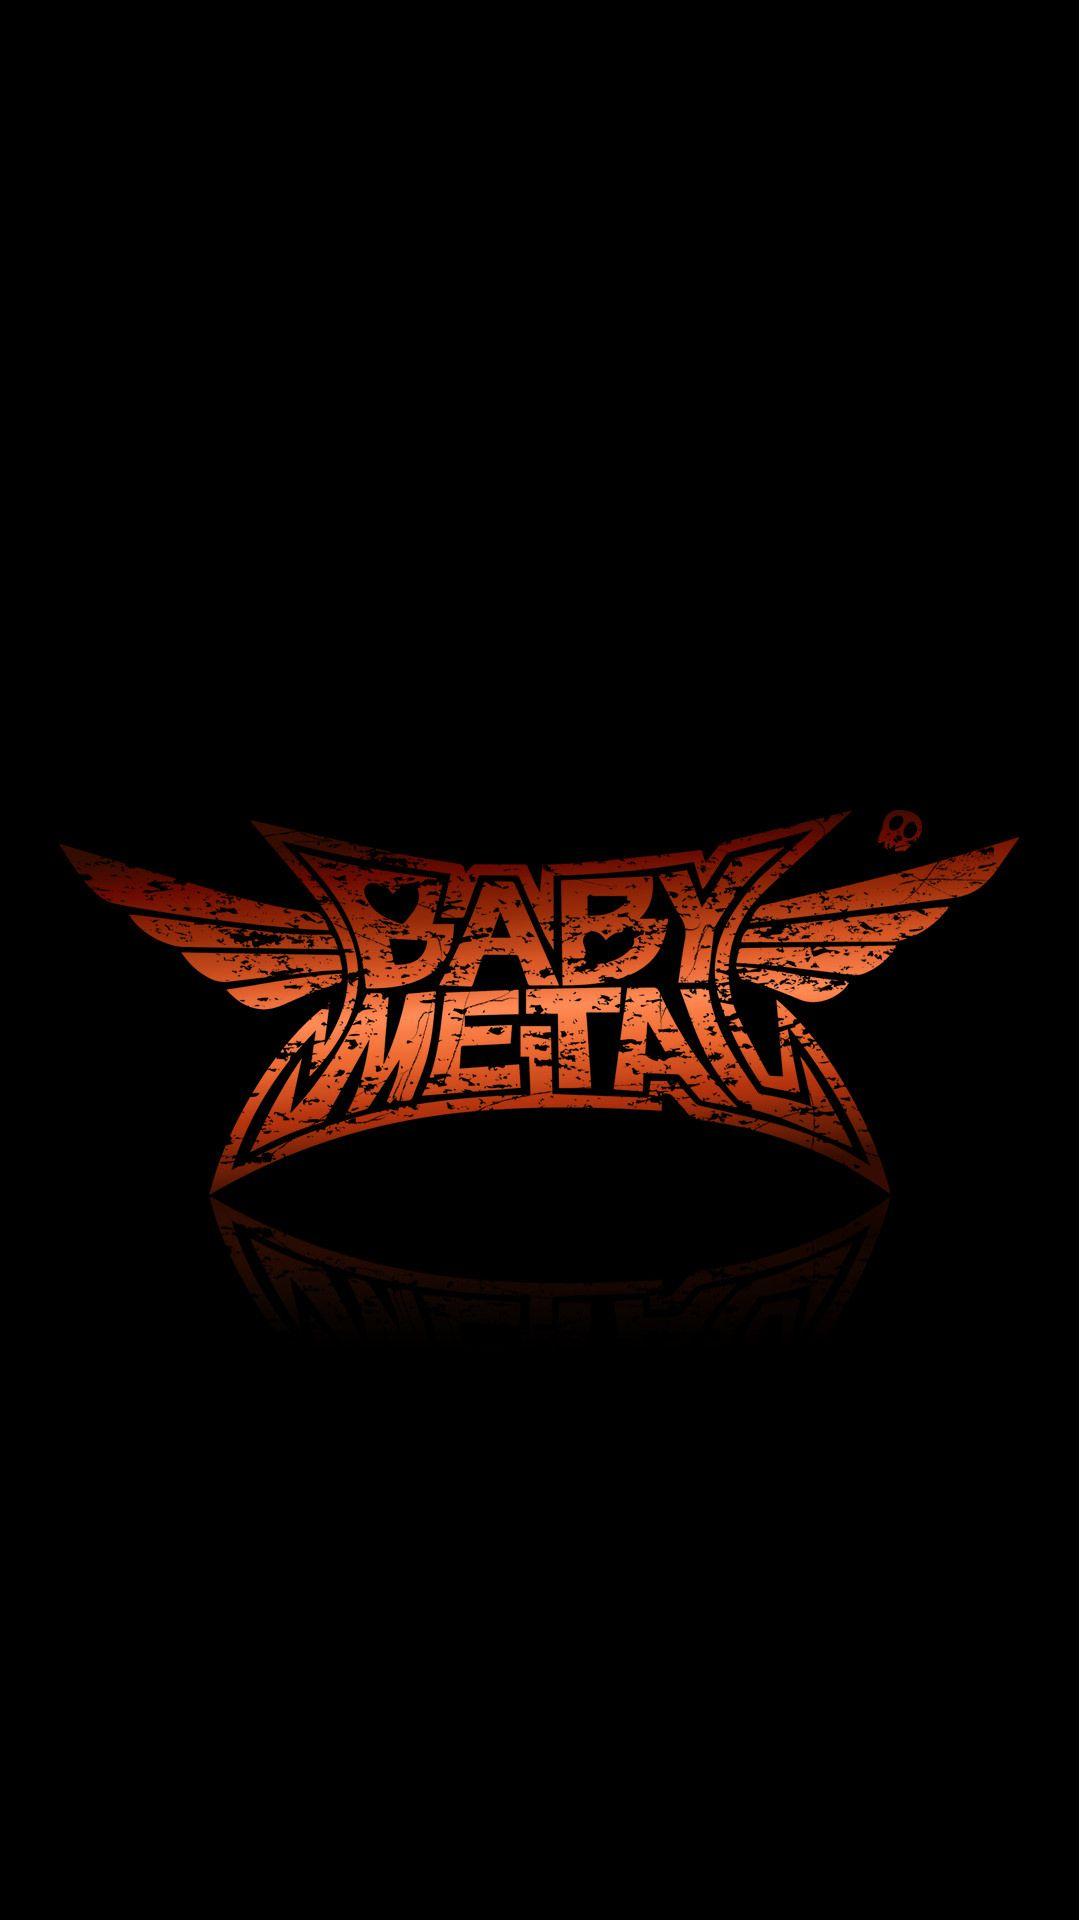 Babymetal 定番ロゴ Babymetal 壁紙 ヘビーメタル バンドロゴ